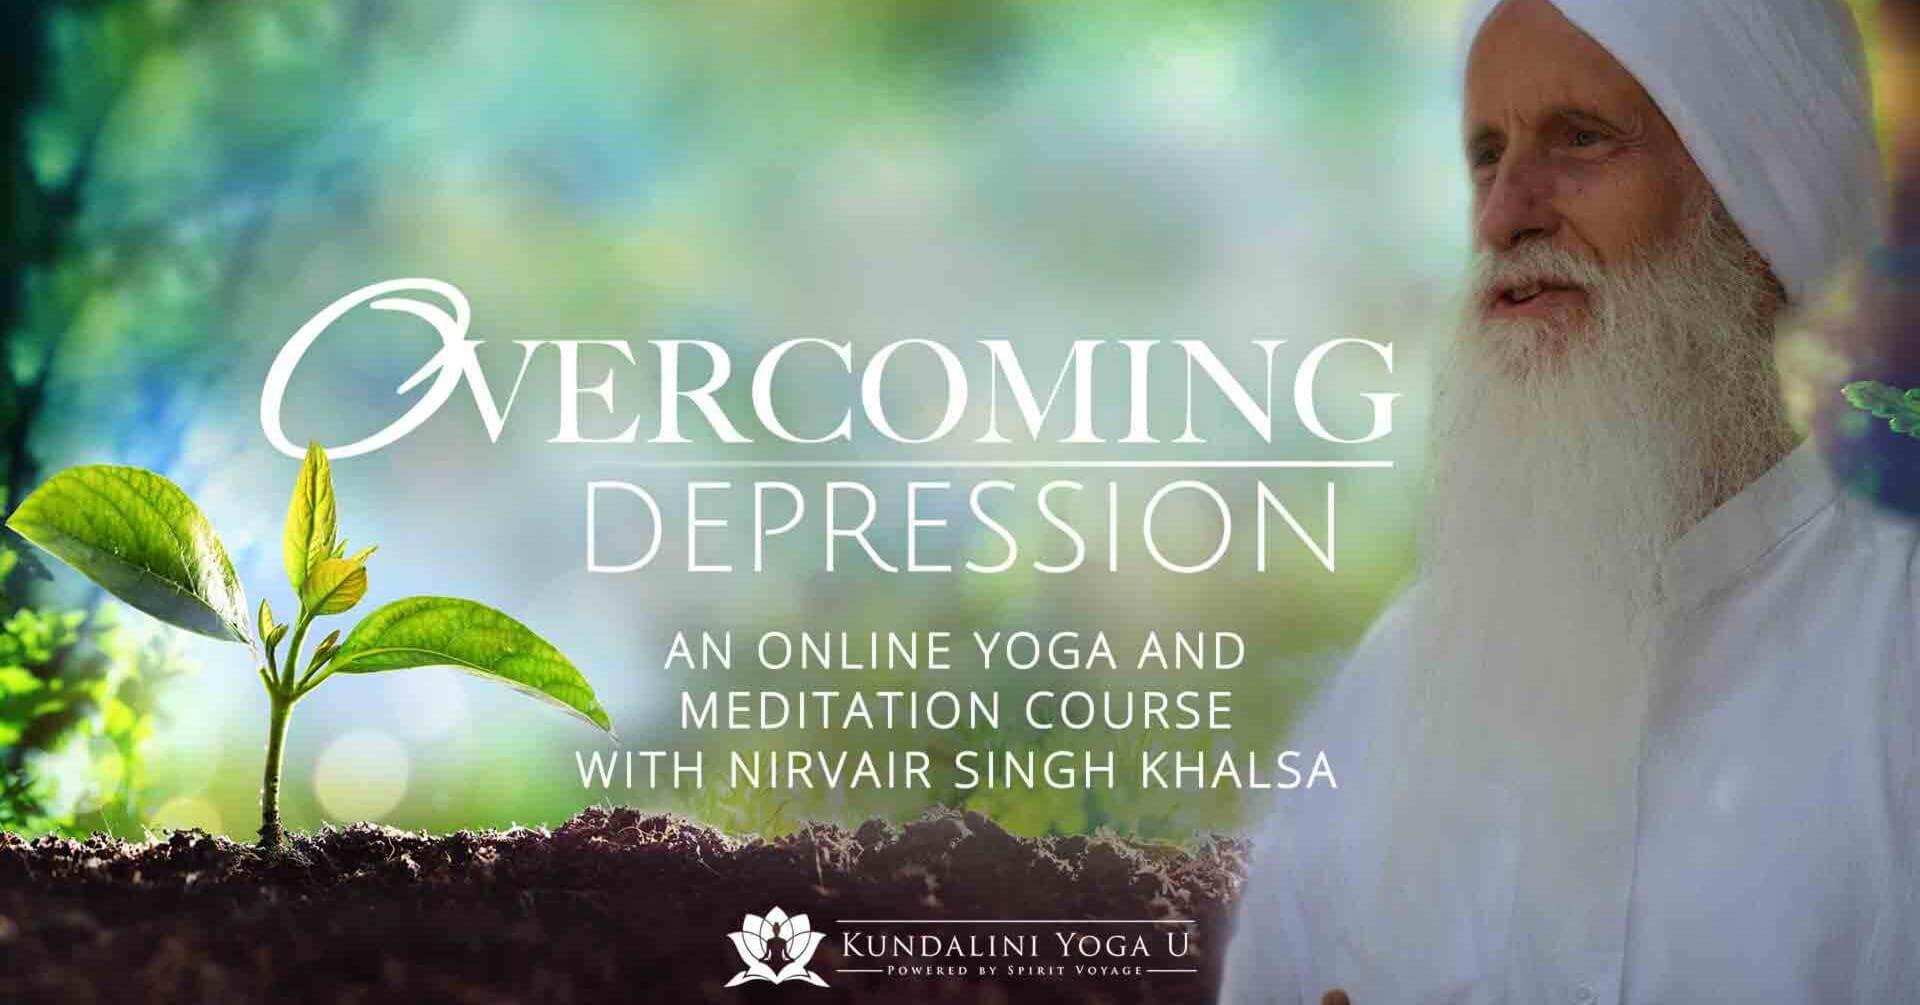 Overcoming Depression - A Kundalini Yoga U Course with Nirvair Singh